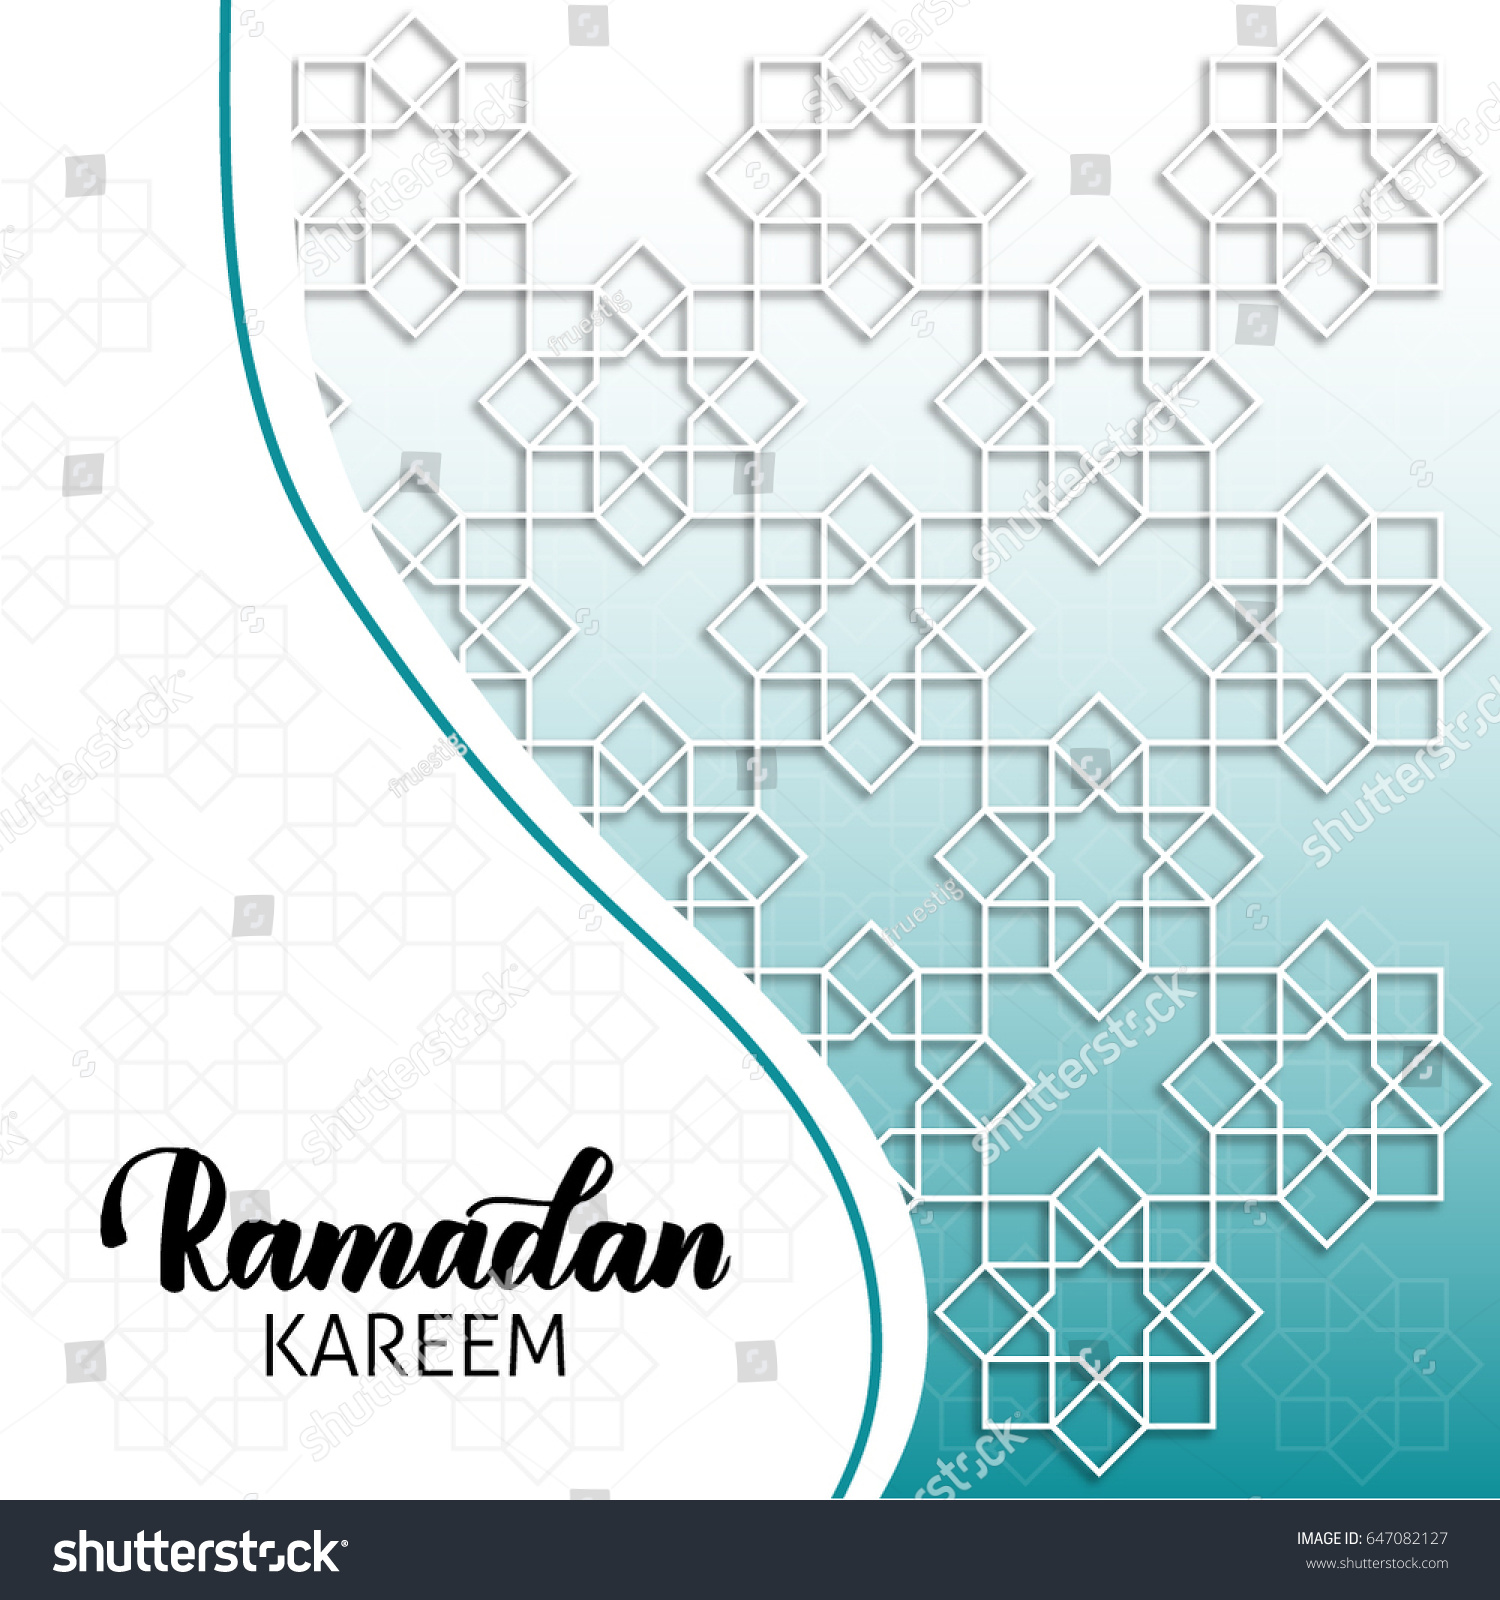 Ramadan kareem background ramadan kareem greeting stock vector ramadan kareem background ramadan kareem greeting card with muslim islamic art web template stopboris Choice Image